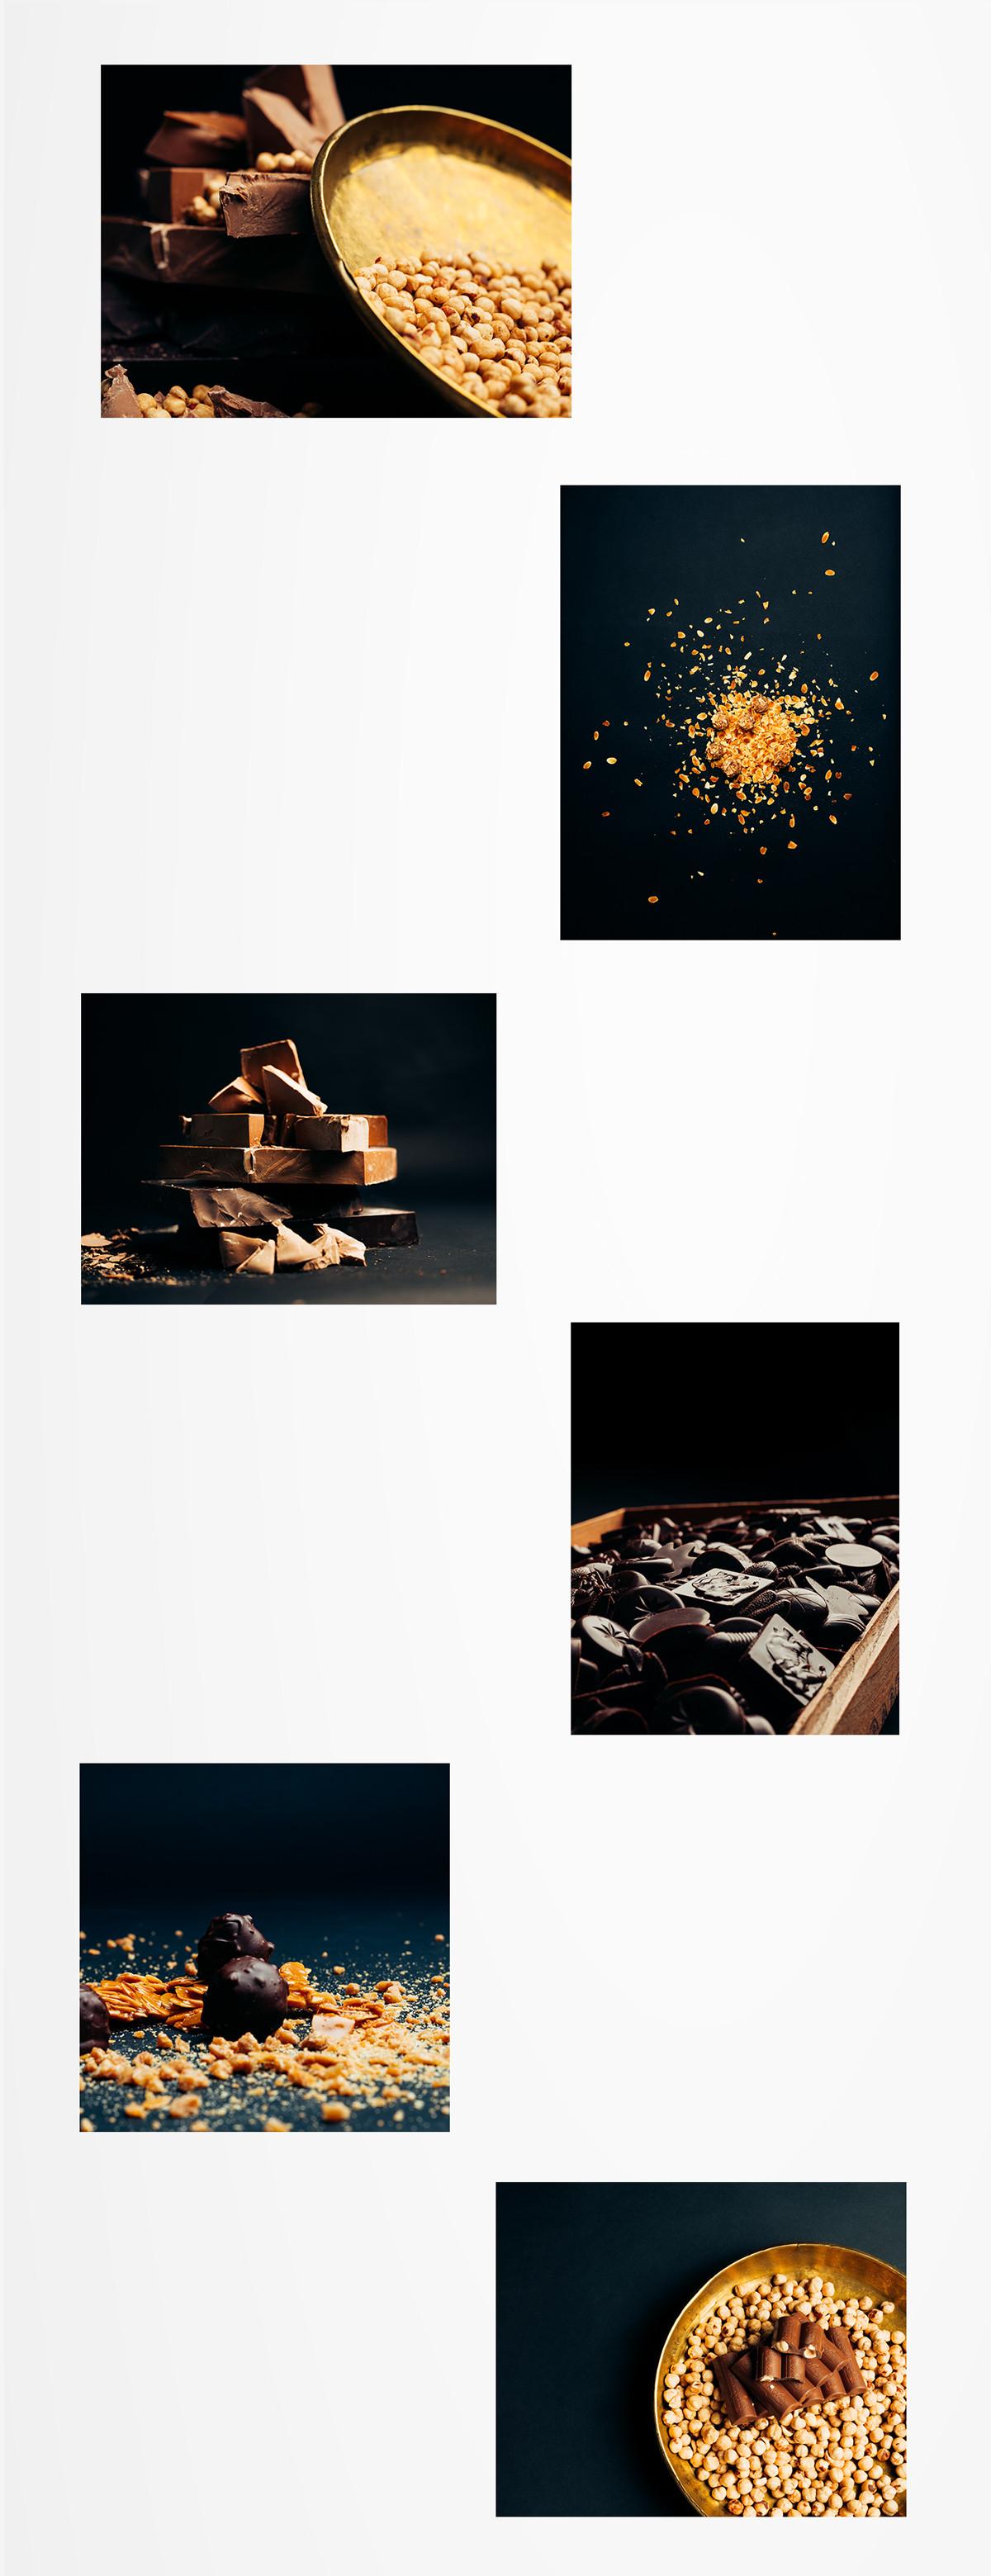 V-Chocolatier_PhotoComp_01.0